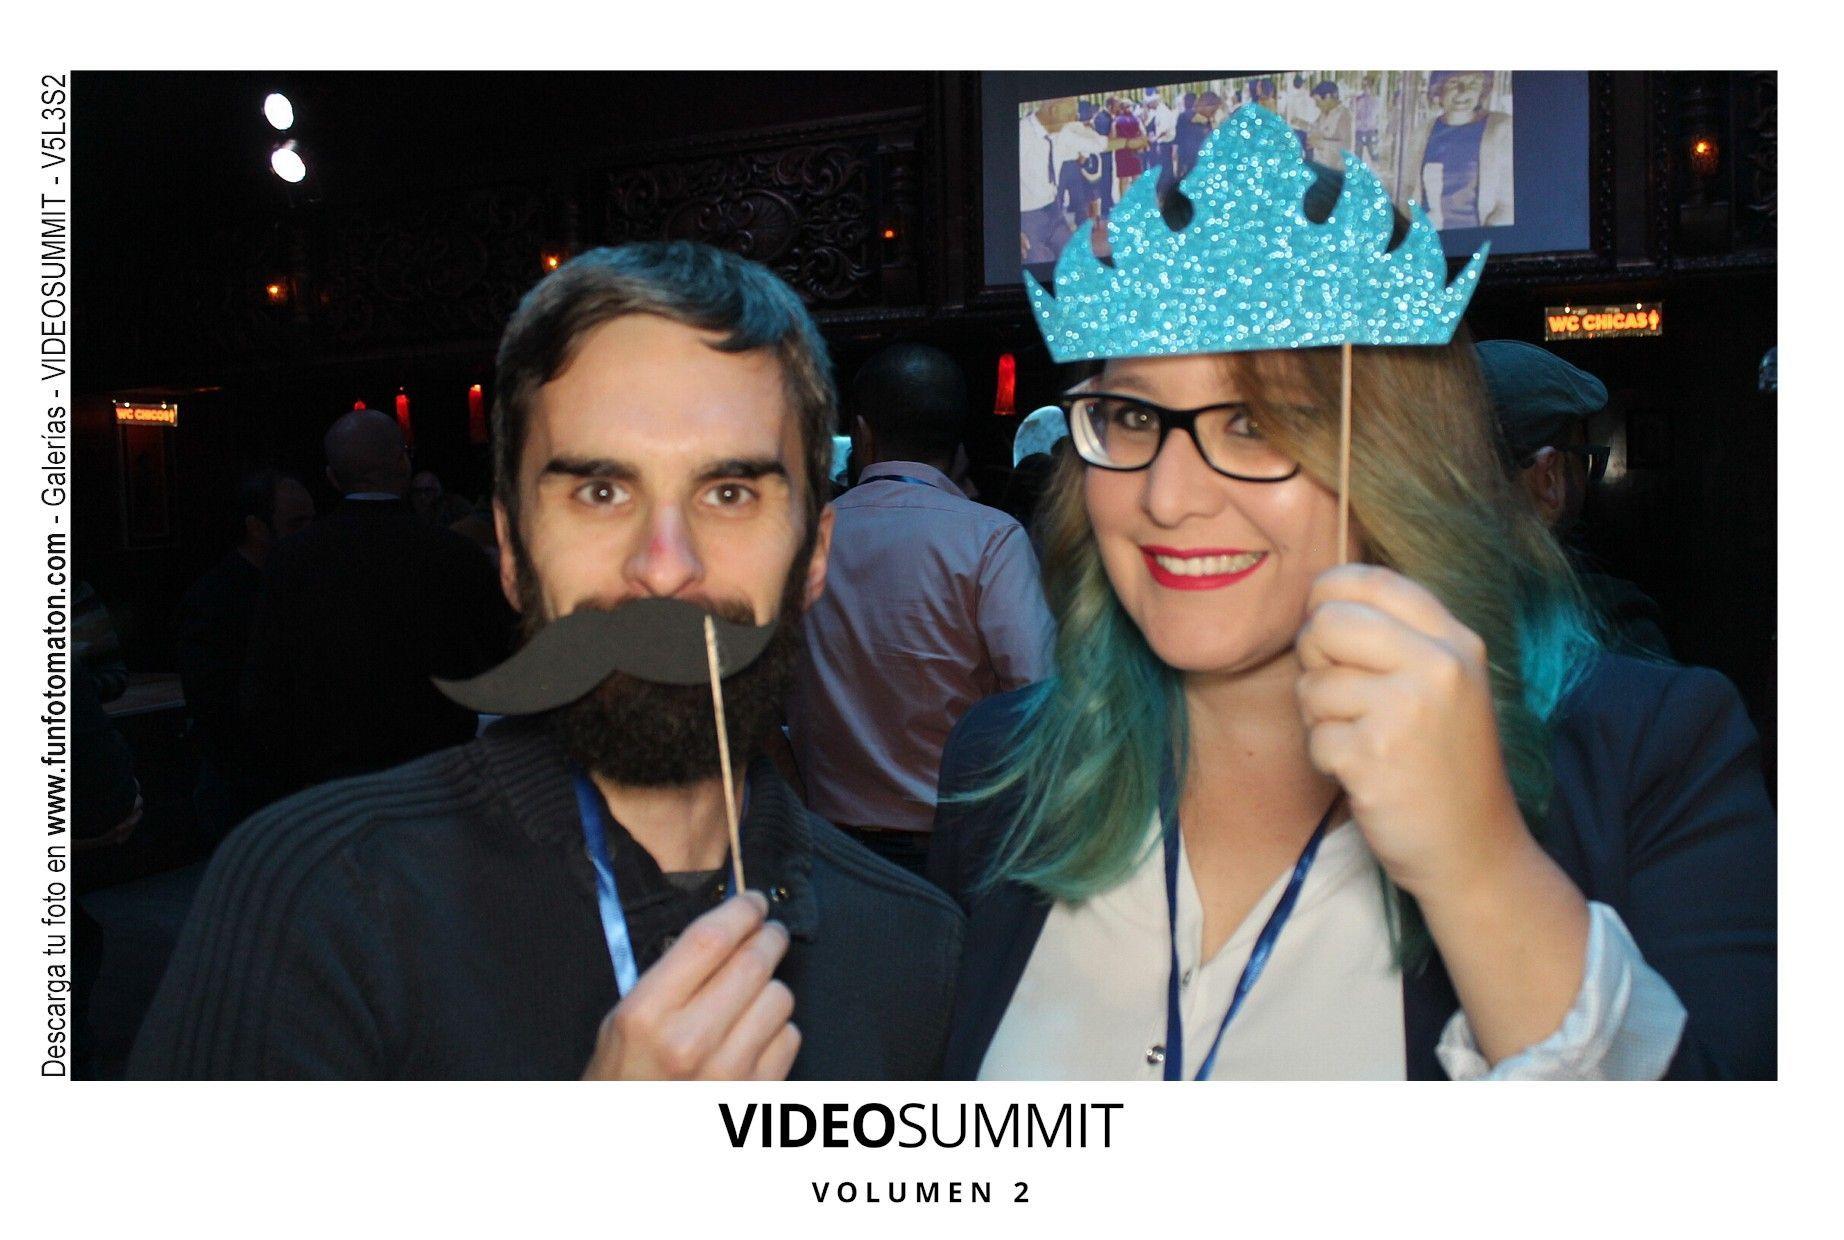 videosummit-vol2-club-party-065